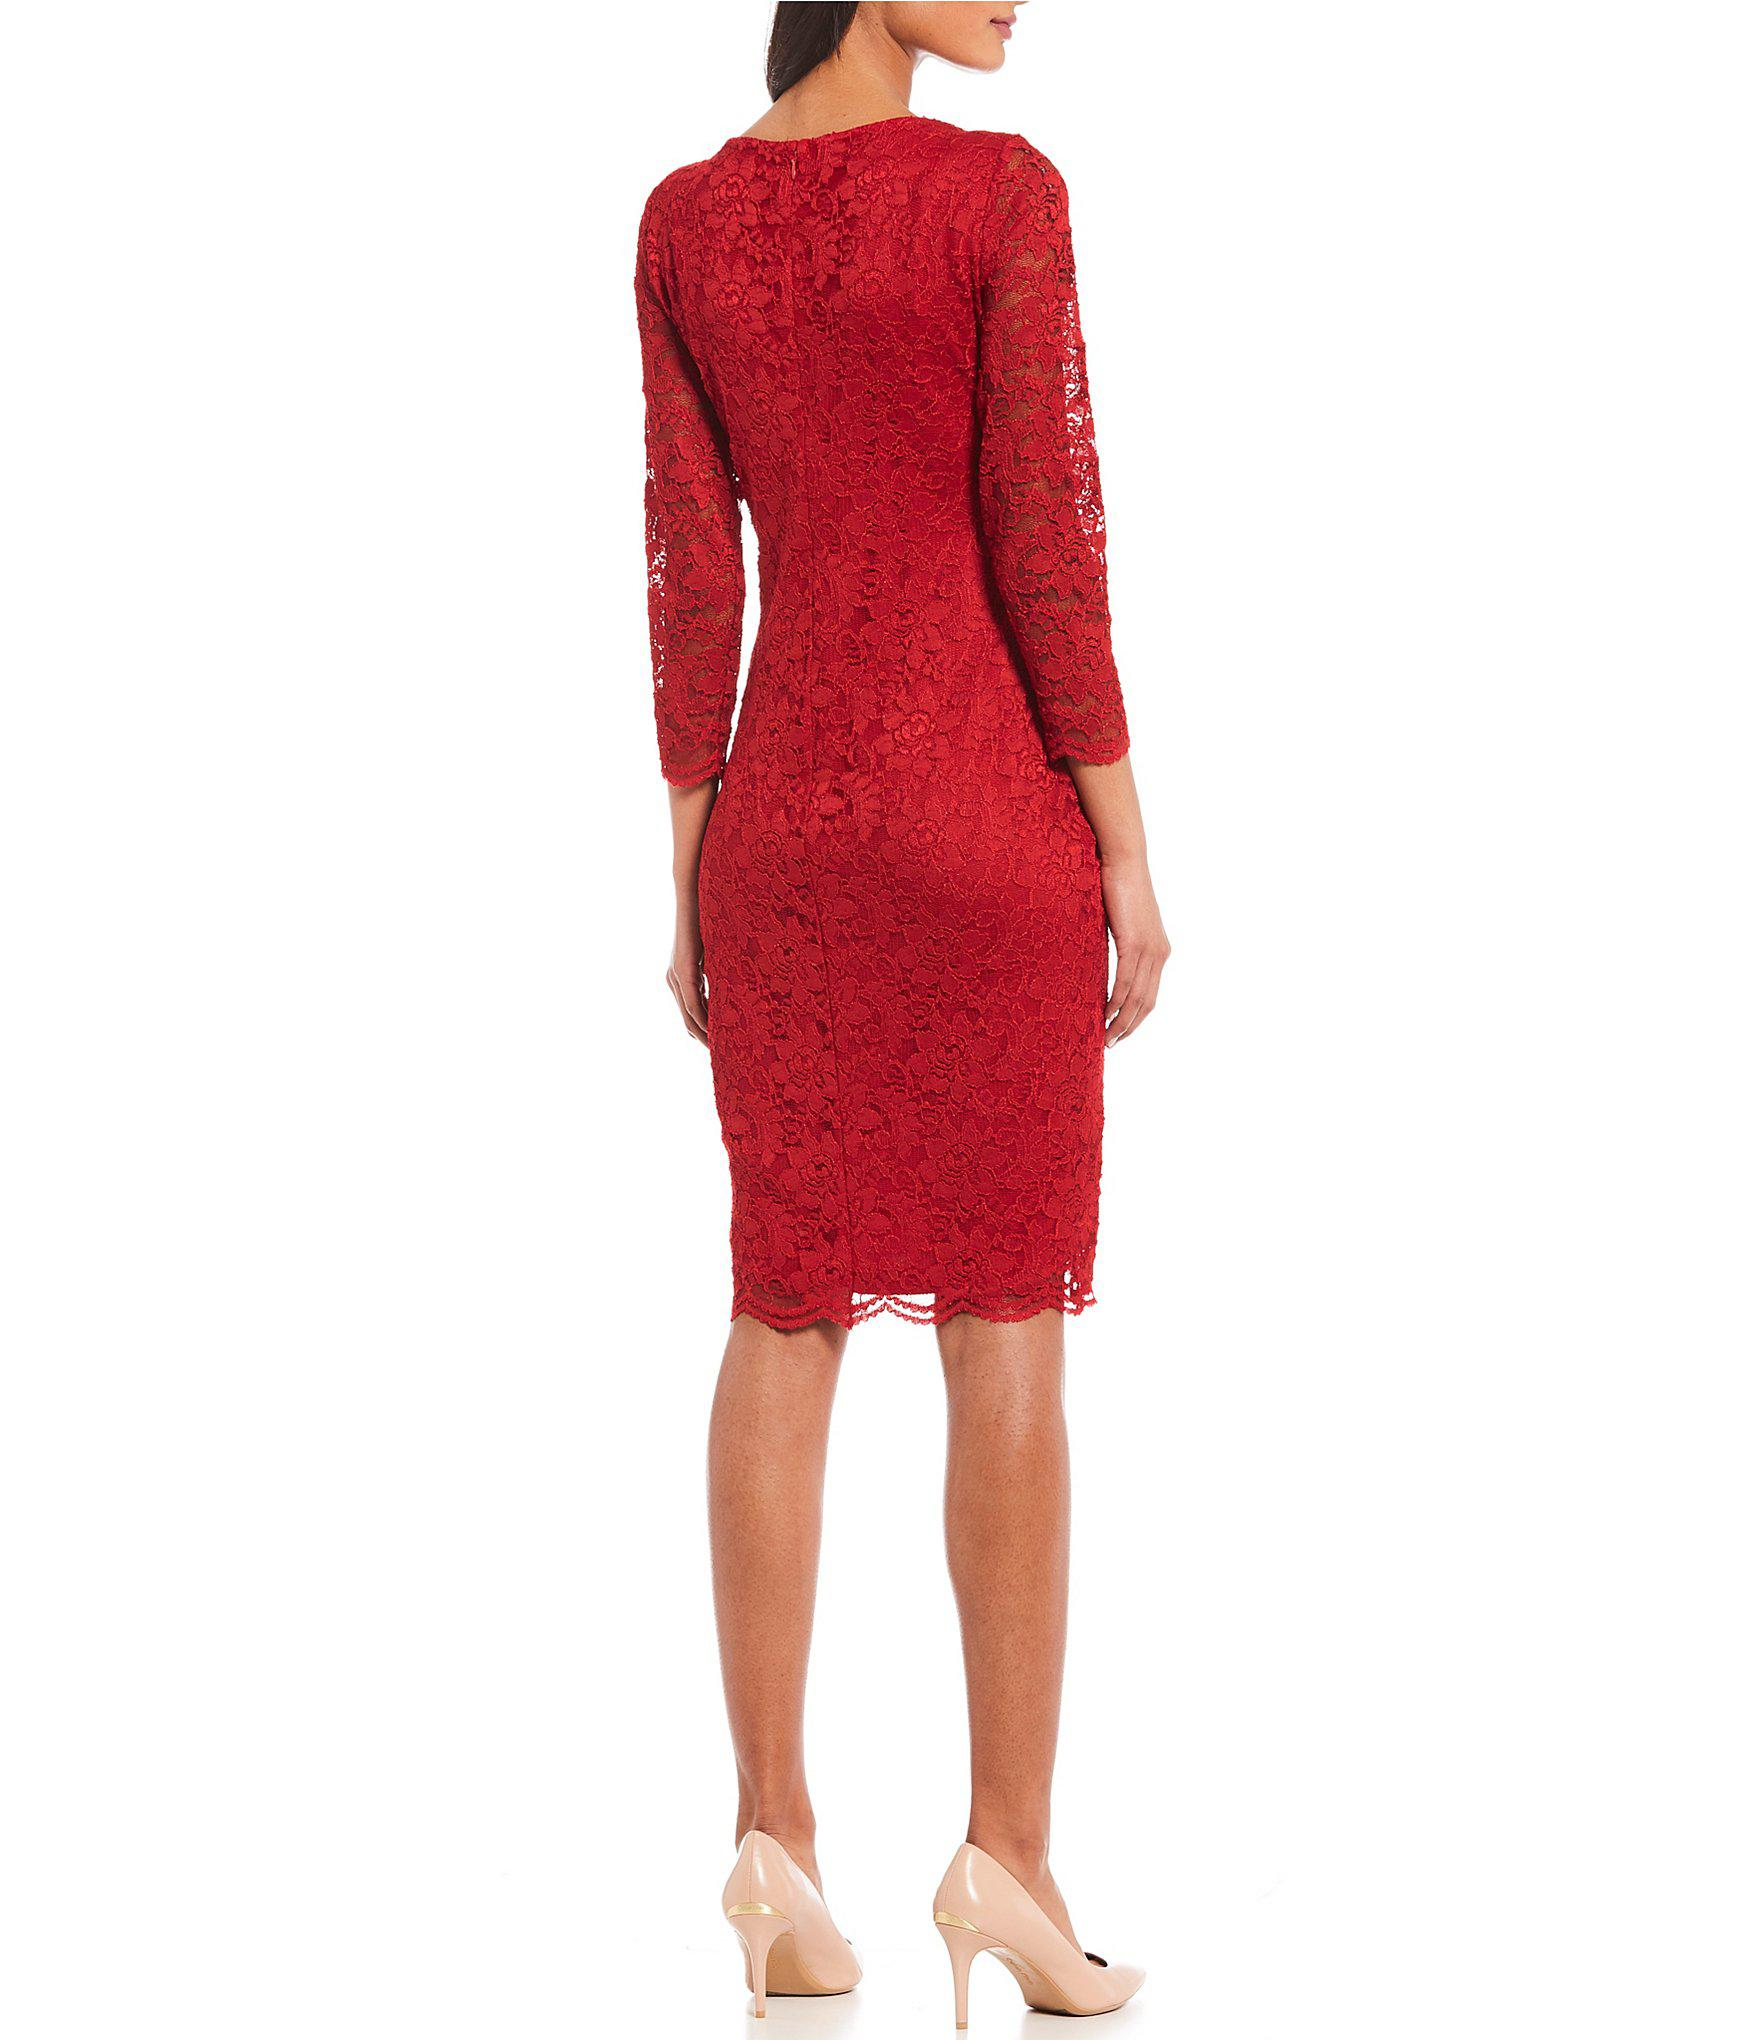 531b07935e3 Lyst - Calvin Klein 3 4 Sleeve Lace Sheath Dress in Red